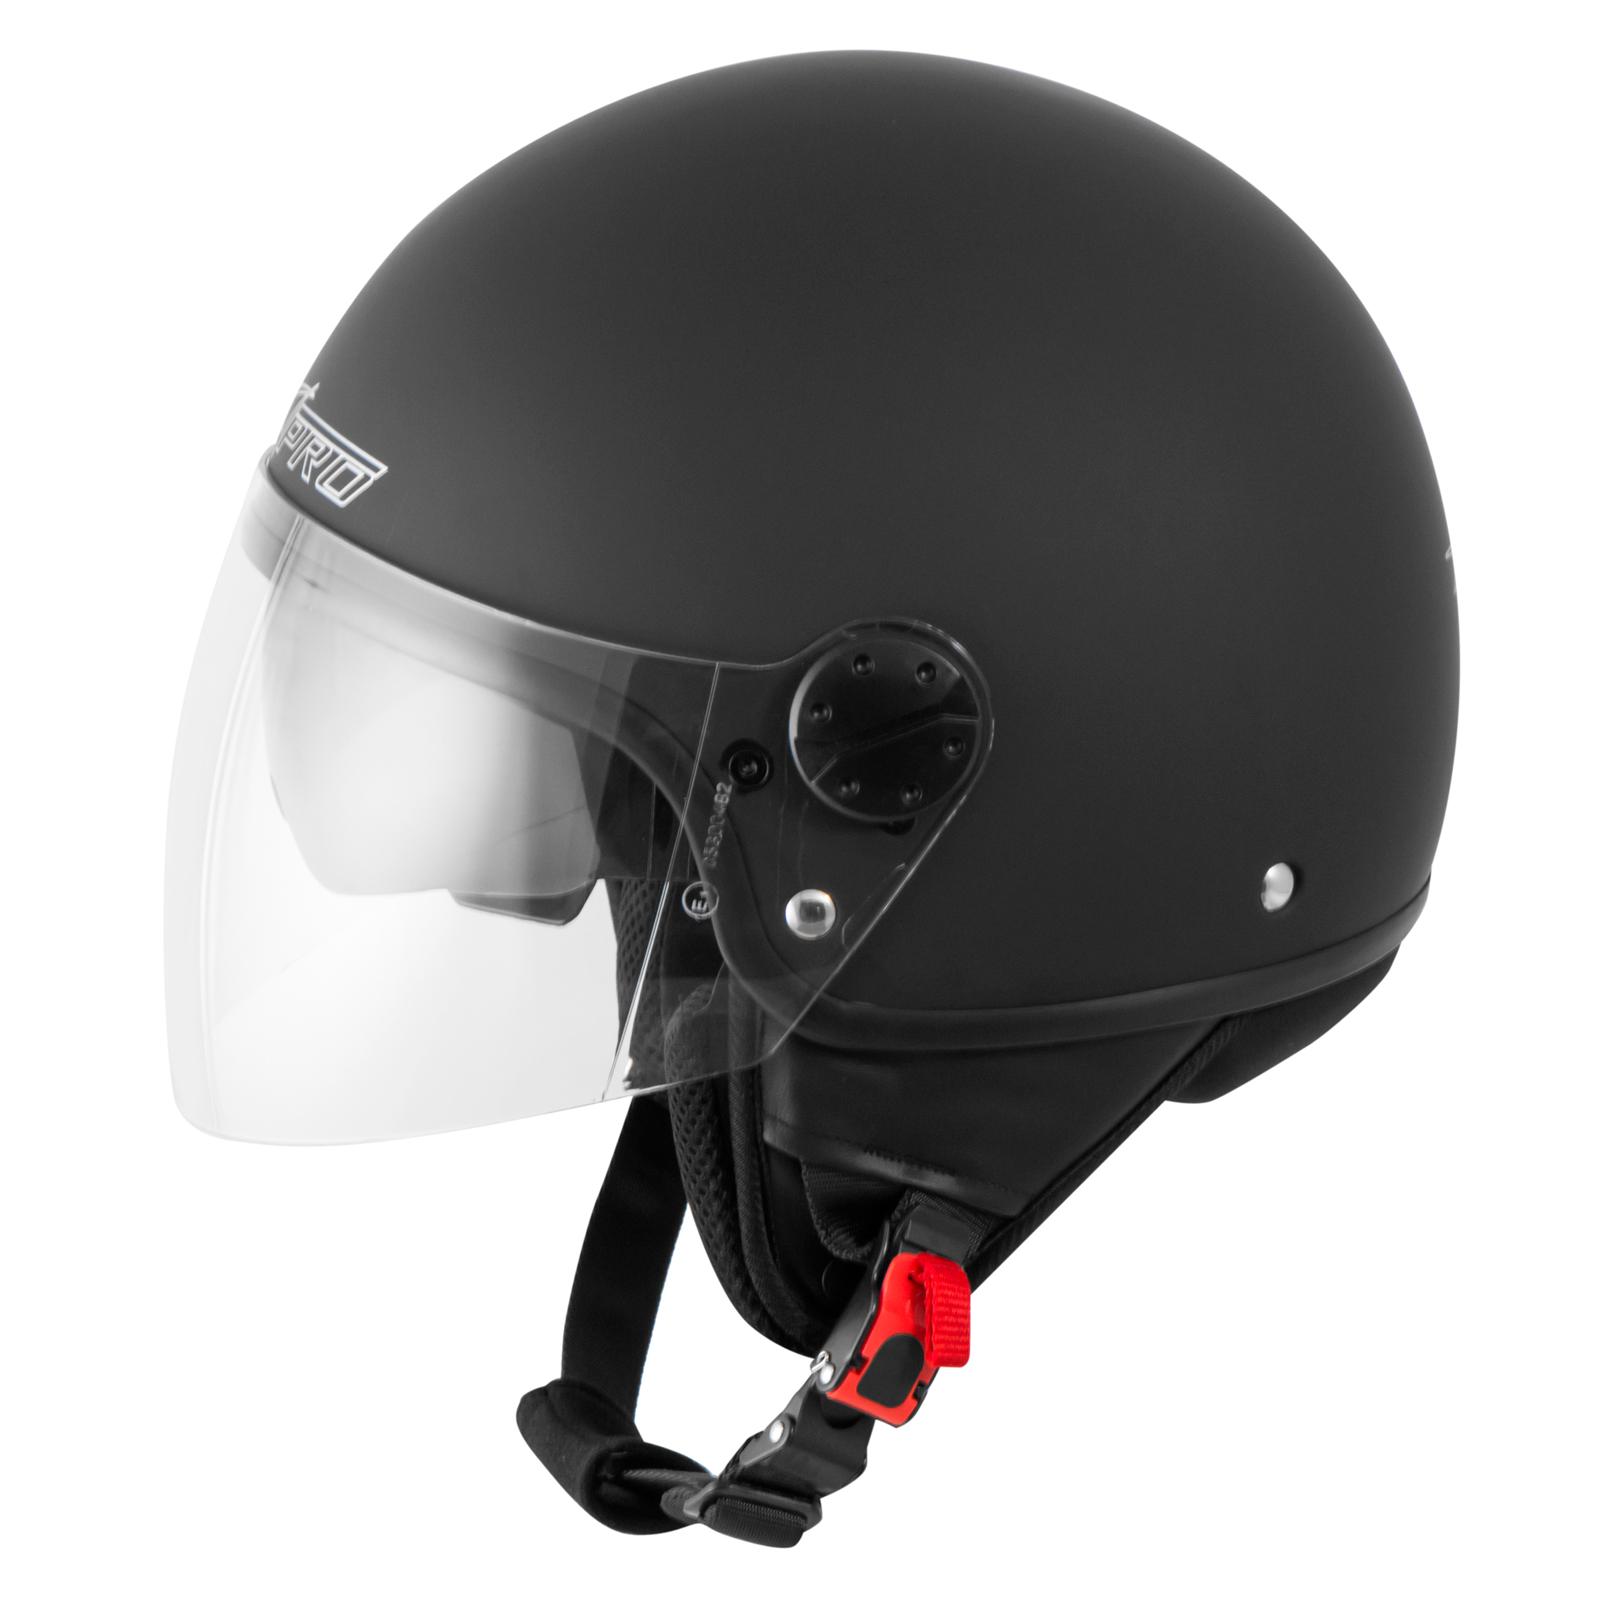 casque moto scooter vespa jet visiere pare soleil ece 22 blanc sonicmoto ebay. Black Bedroom Furniture Sets. Home Design Ideas